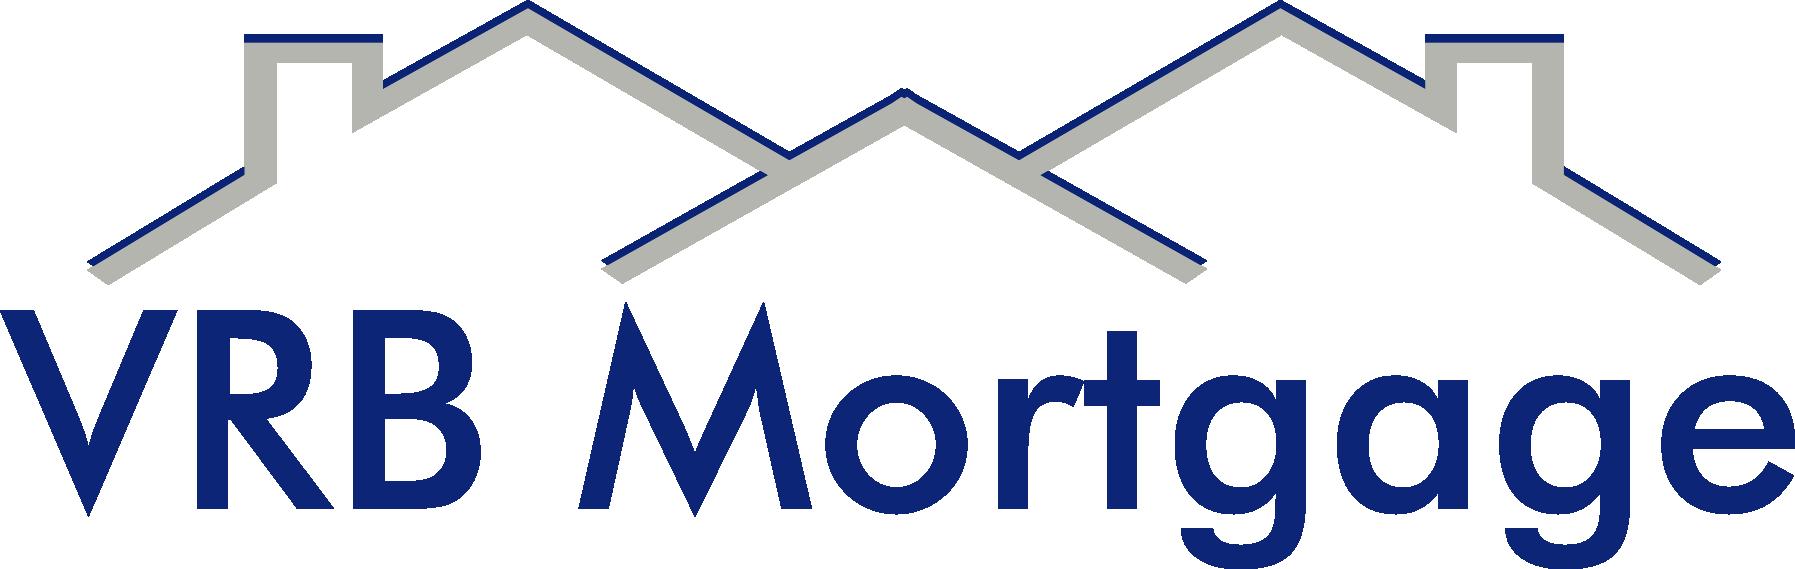 VRB Mortgage